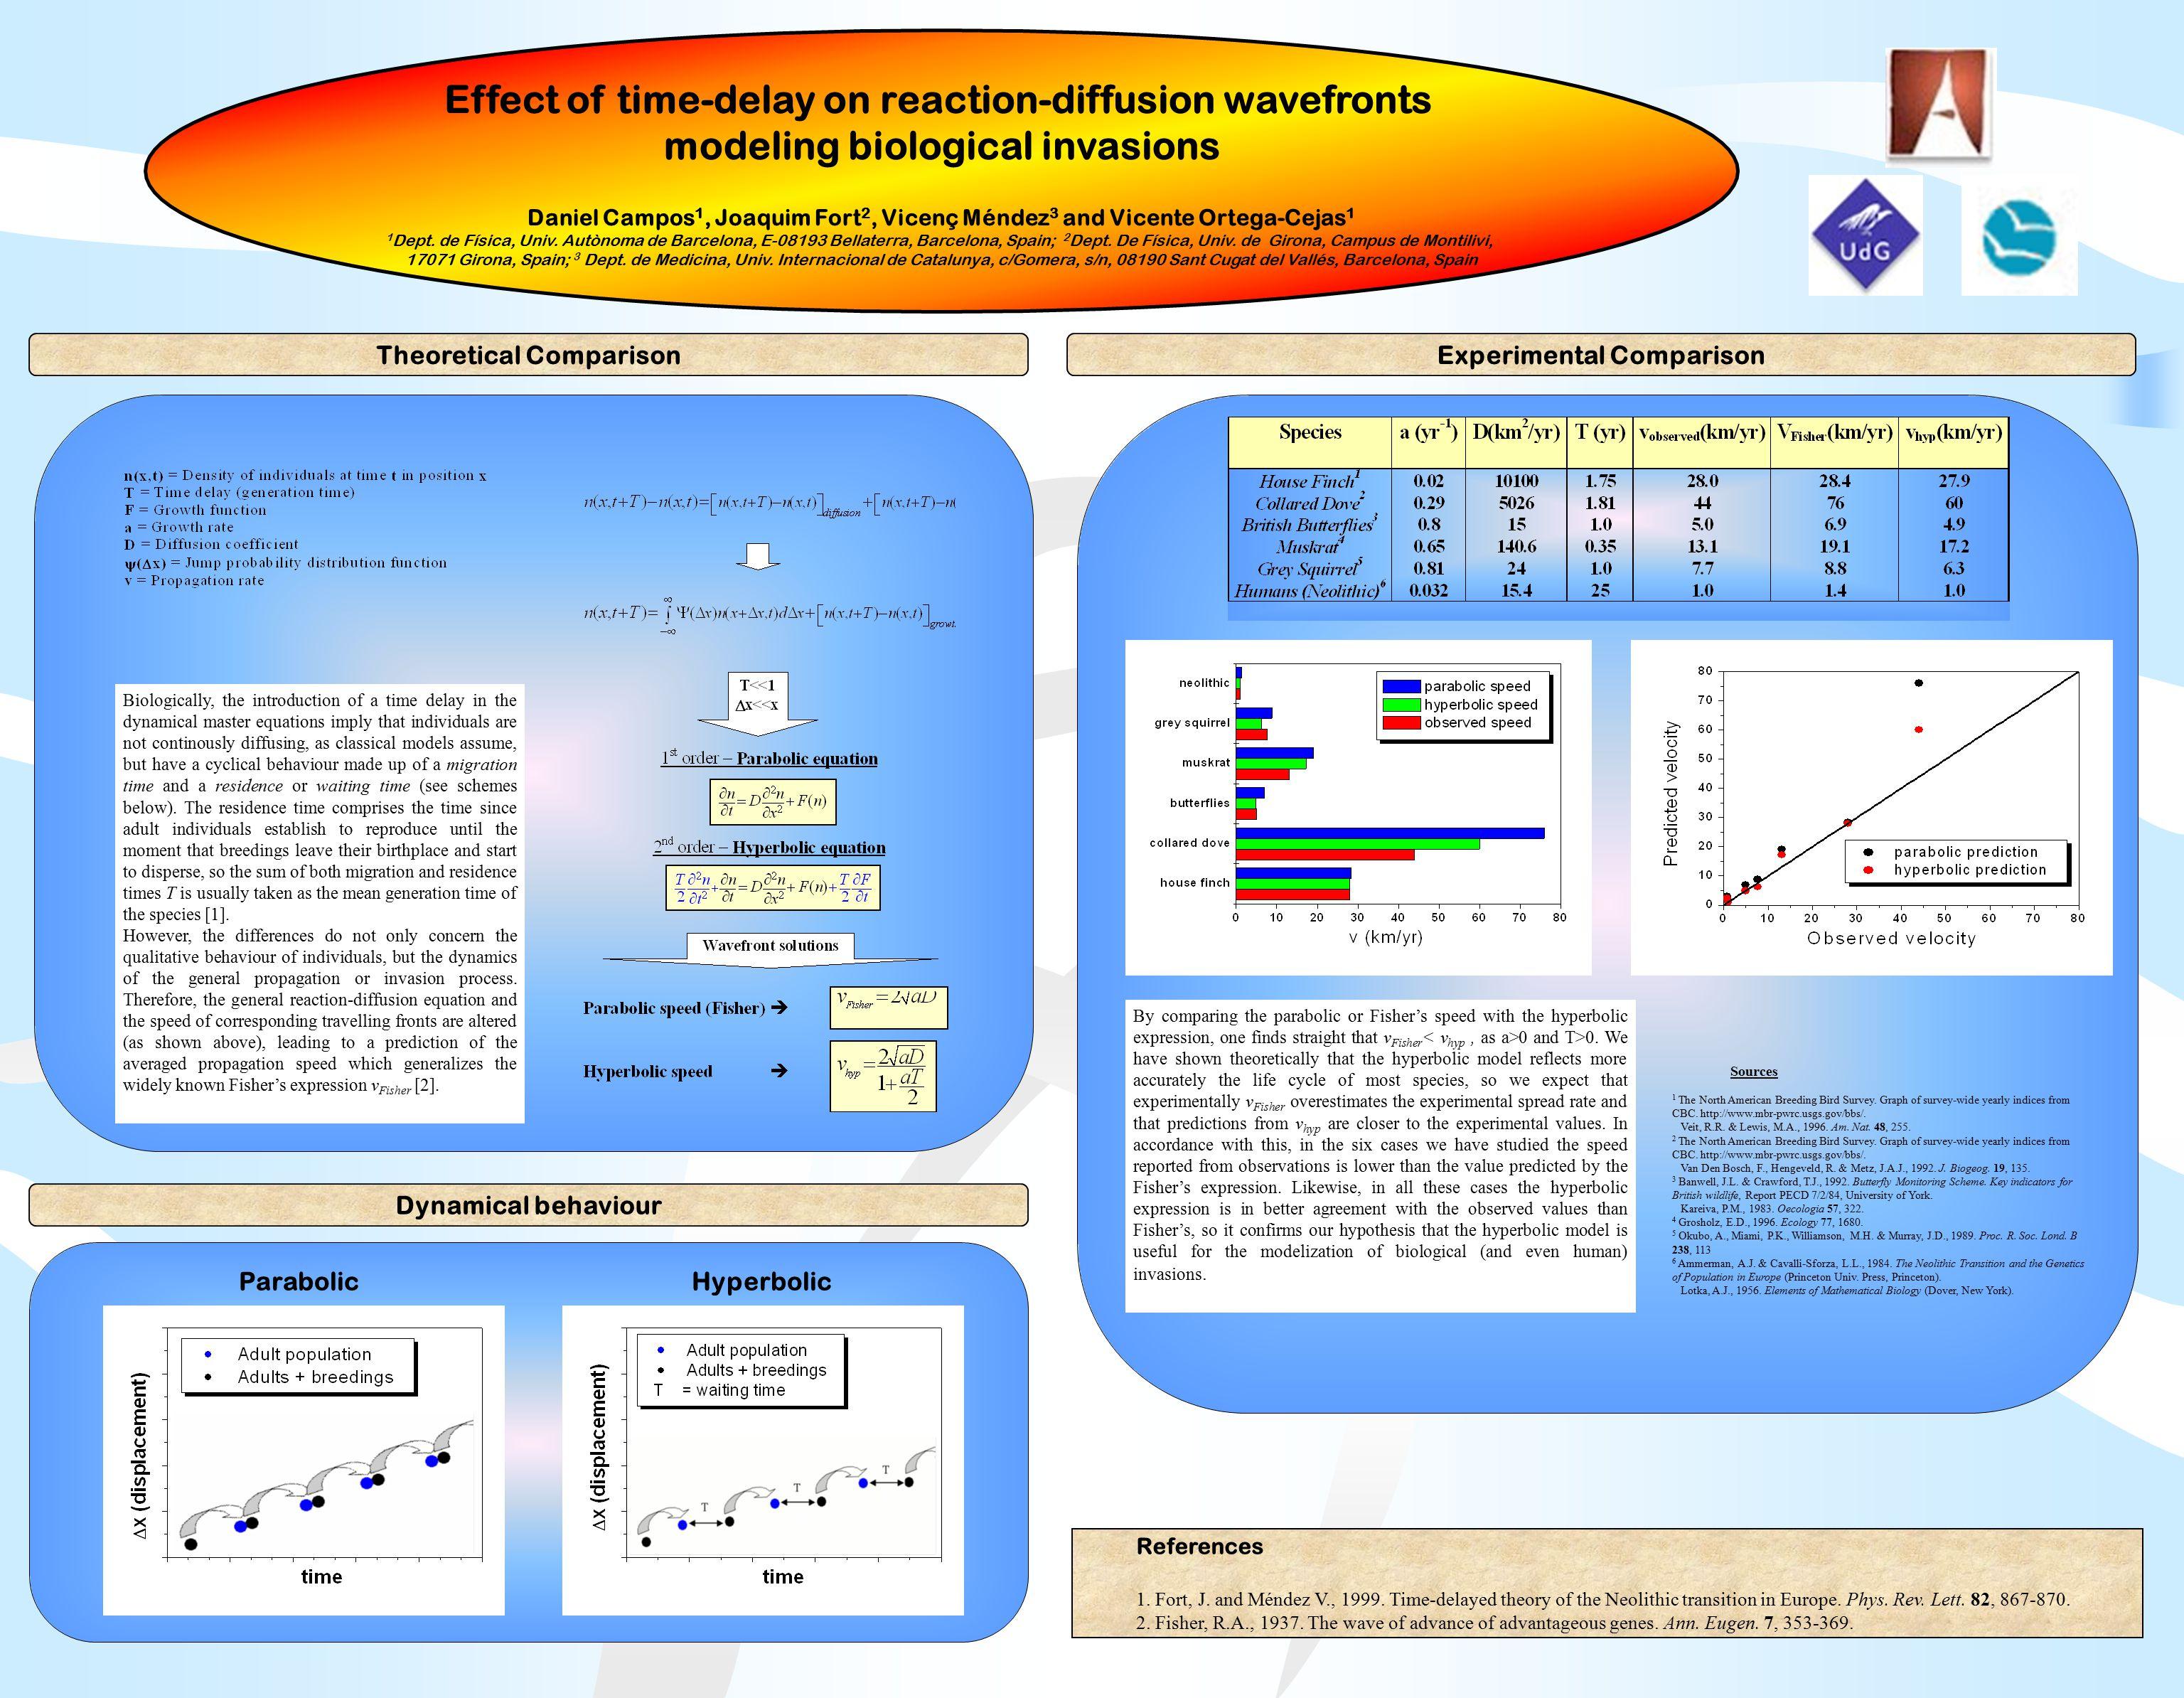 Effect of time-delay on reaction-diffusion wavefronts modeling biological invasions Daniel Campos 1, Joaquim Fort 2, Vicenç Méndez 3 and Vicente Ortega-Cejas 1 1 Dept.